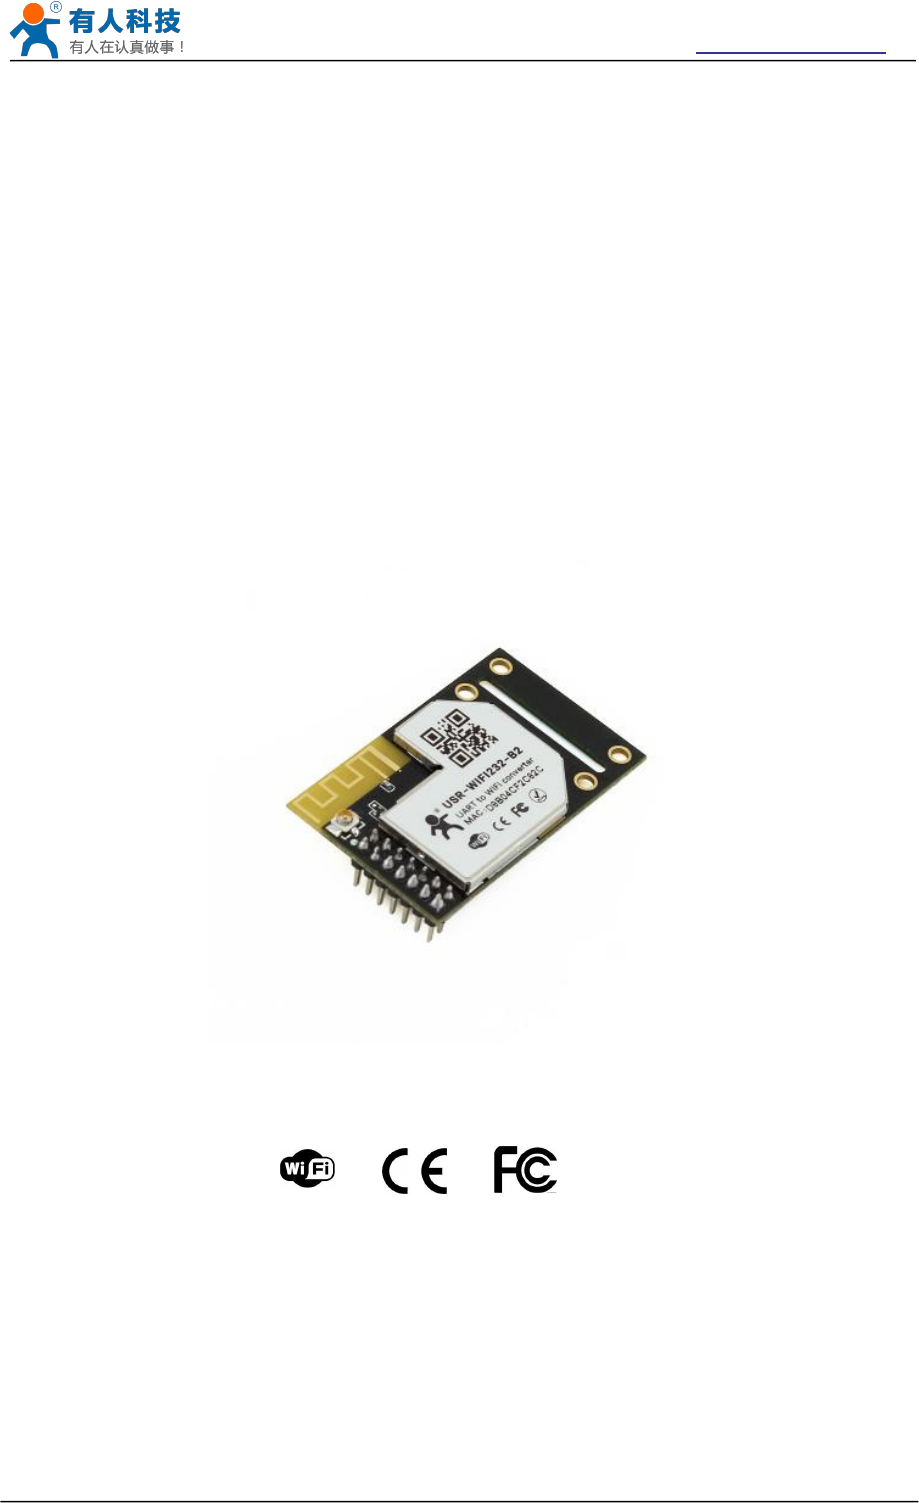 Shandong USR IOT Technology USR-WIFI232 Serial to WIFI